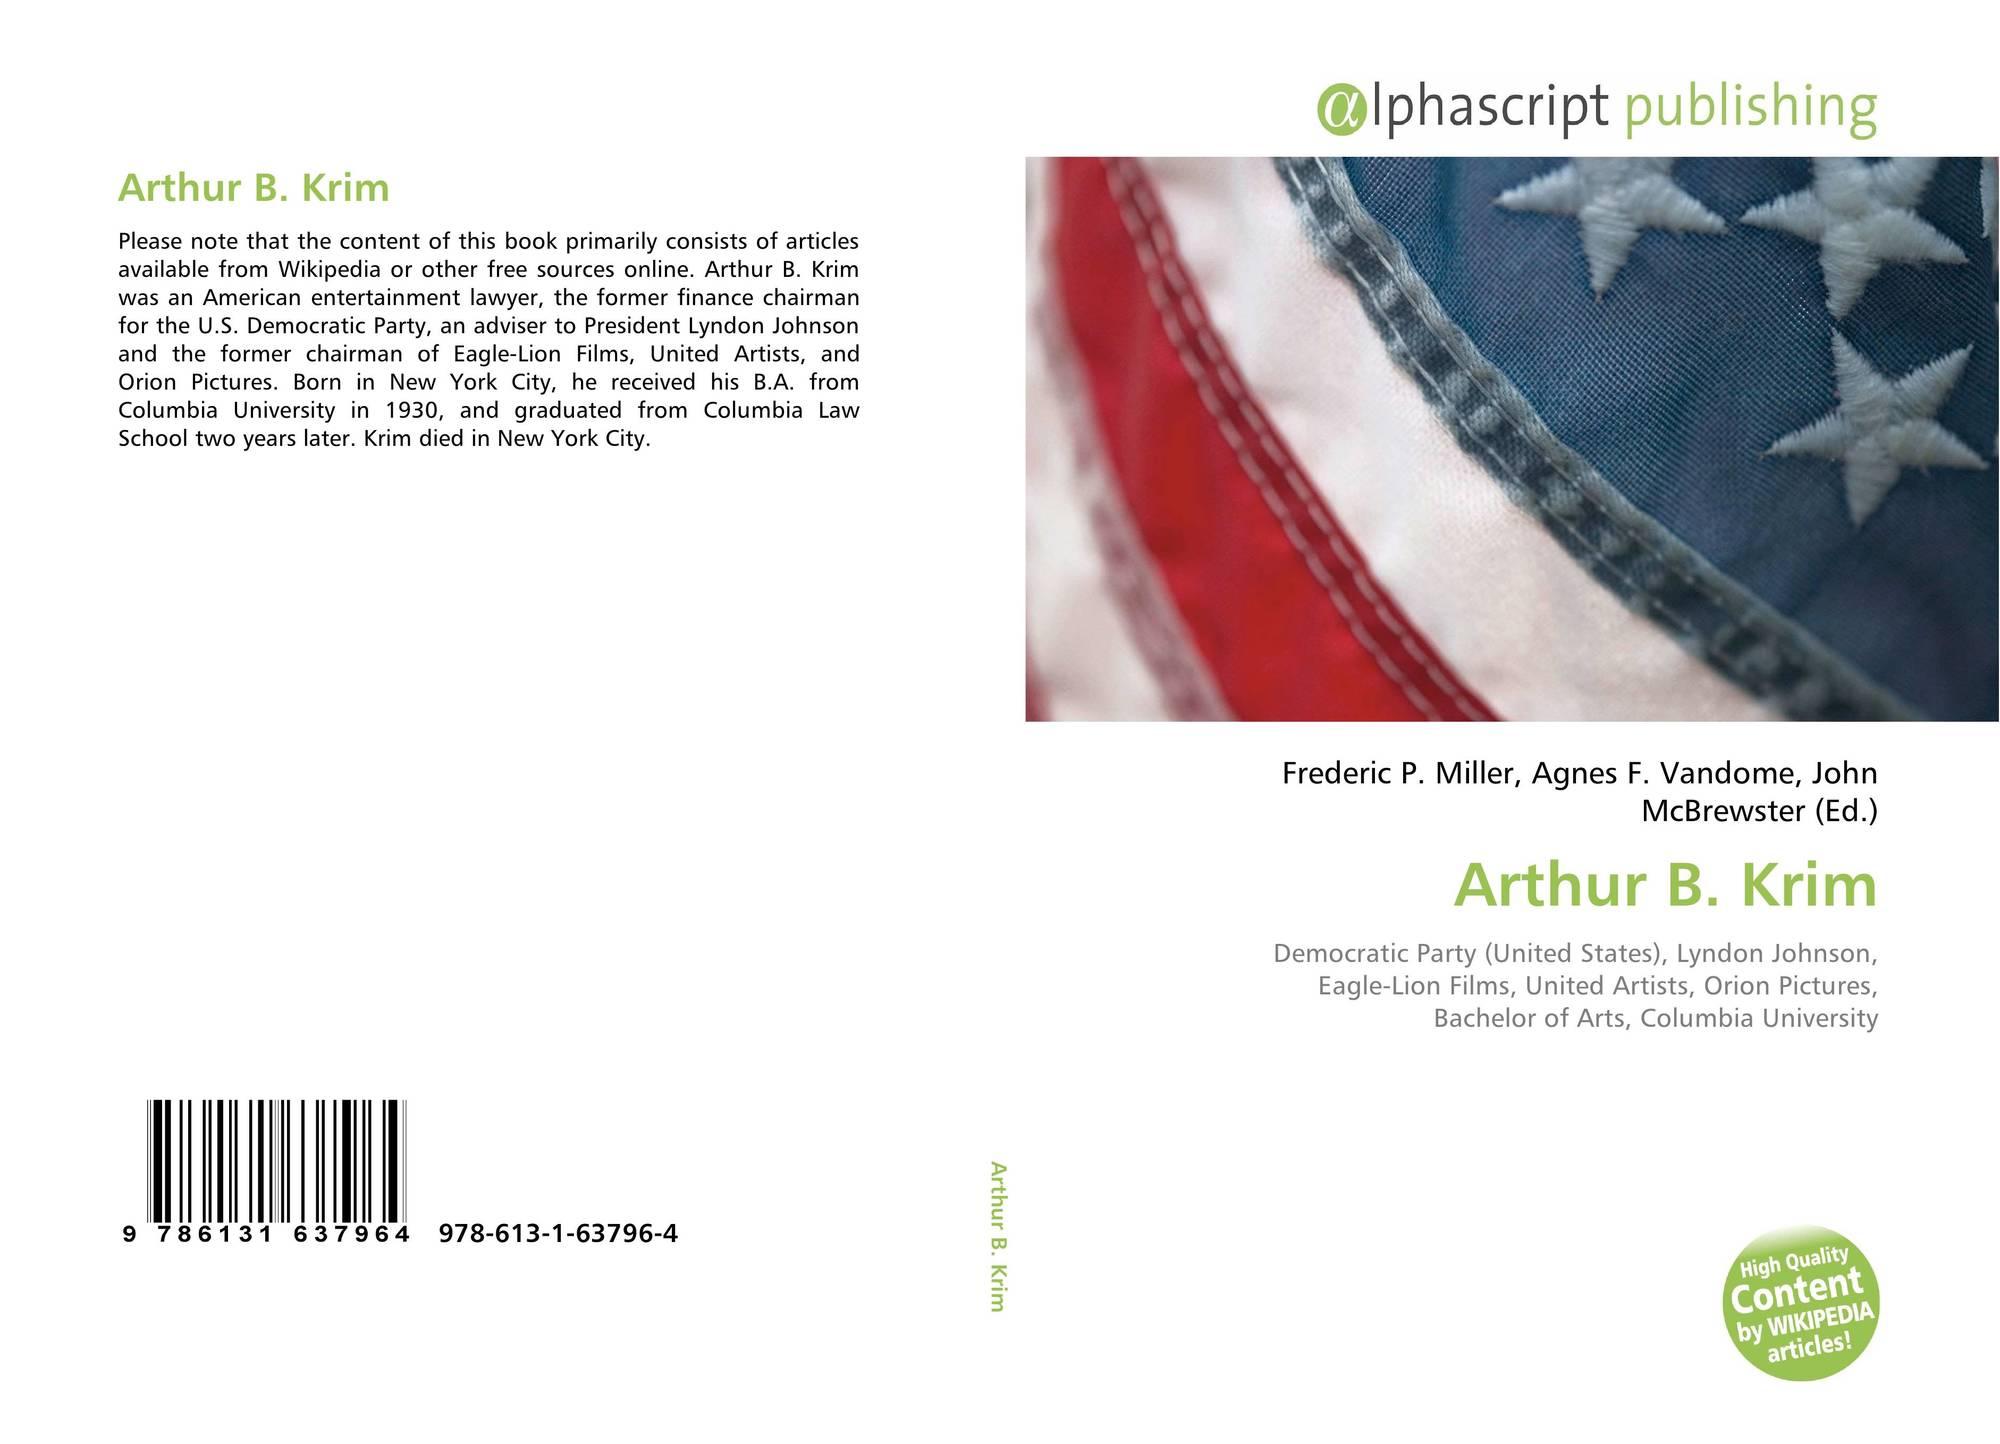 Arthur B. Krim, 978-613-1-63796-4, 6131637962 ,9786131637964